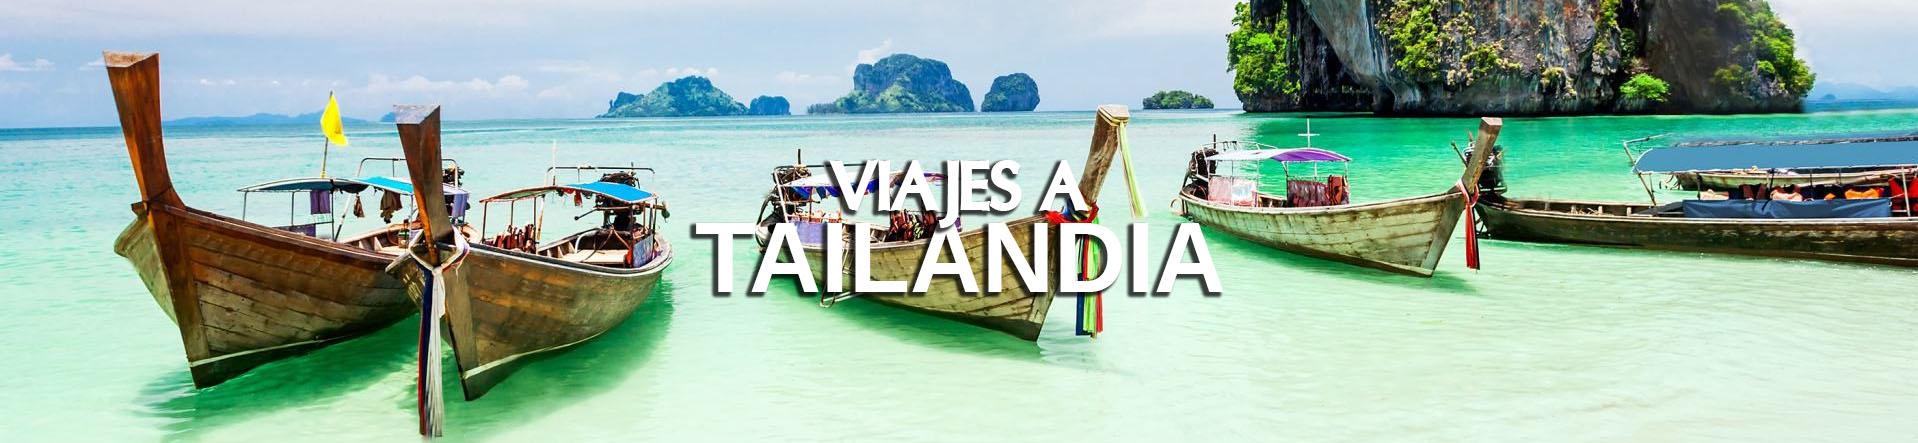 Tailandia desde Argentina